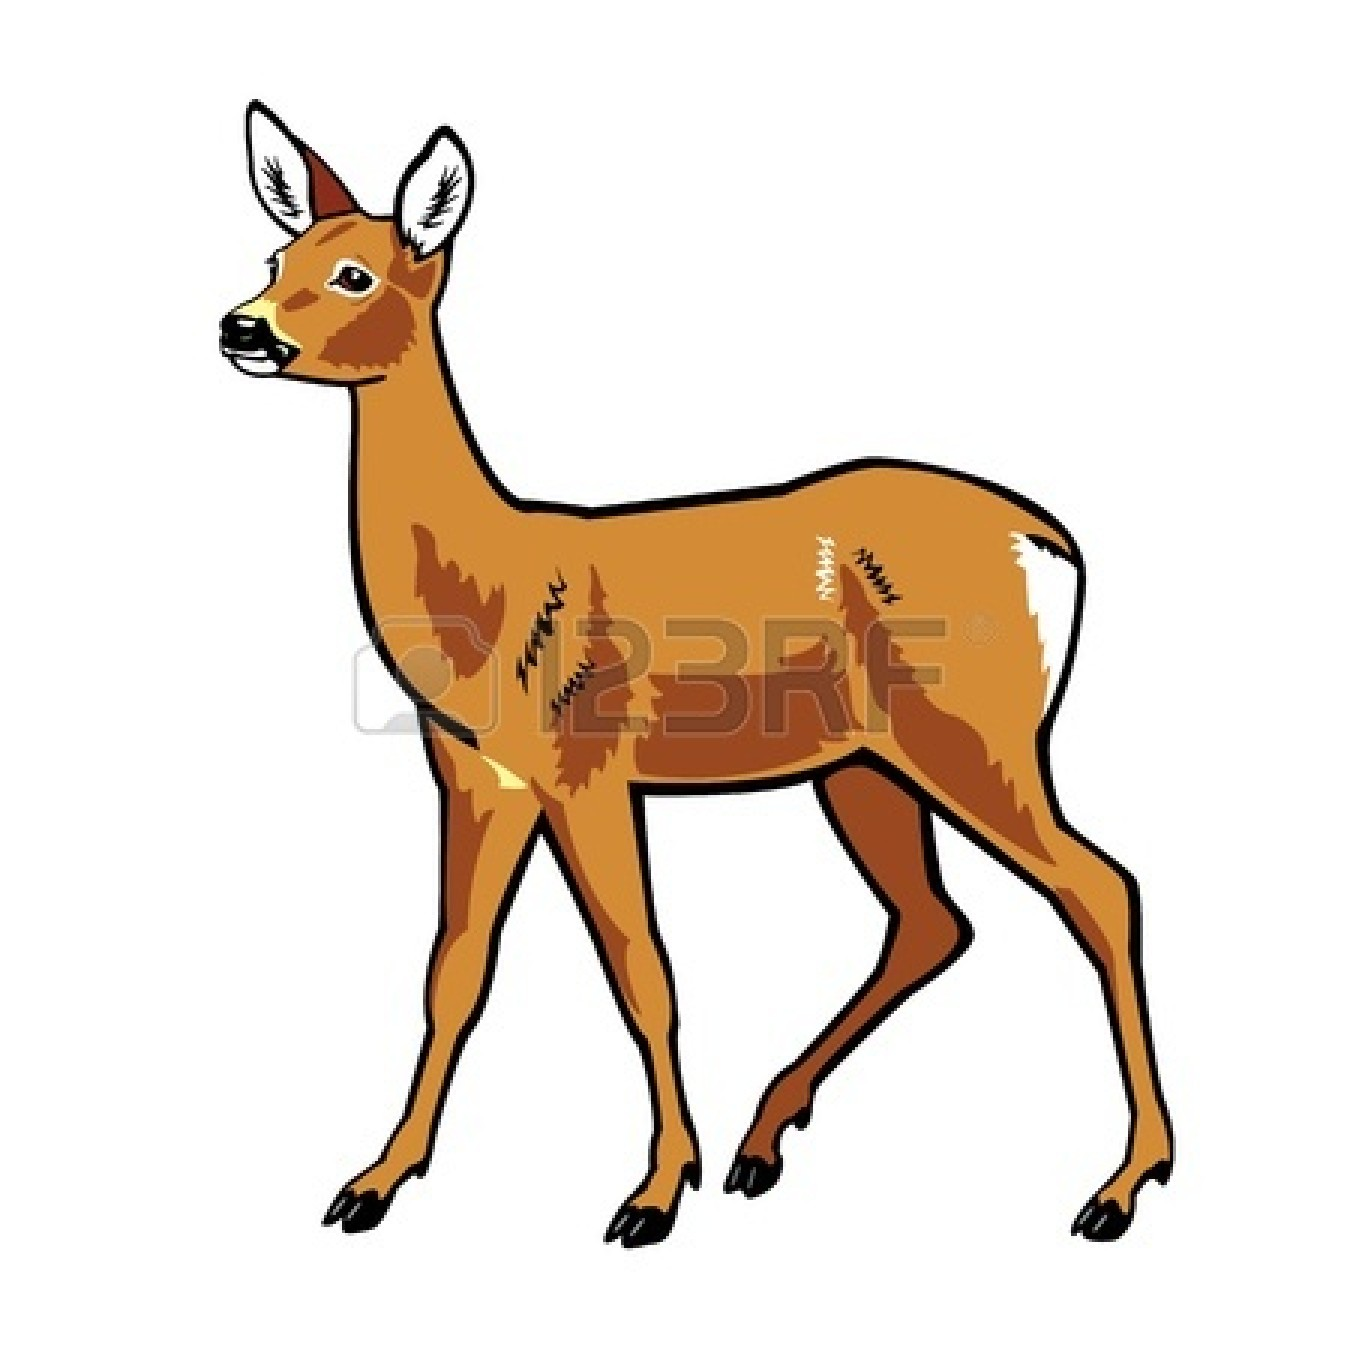 1350x1350 Baby Deer Top Deer Clipart Free Image